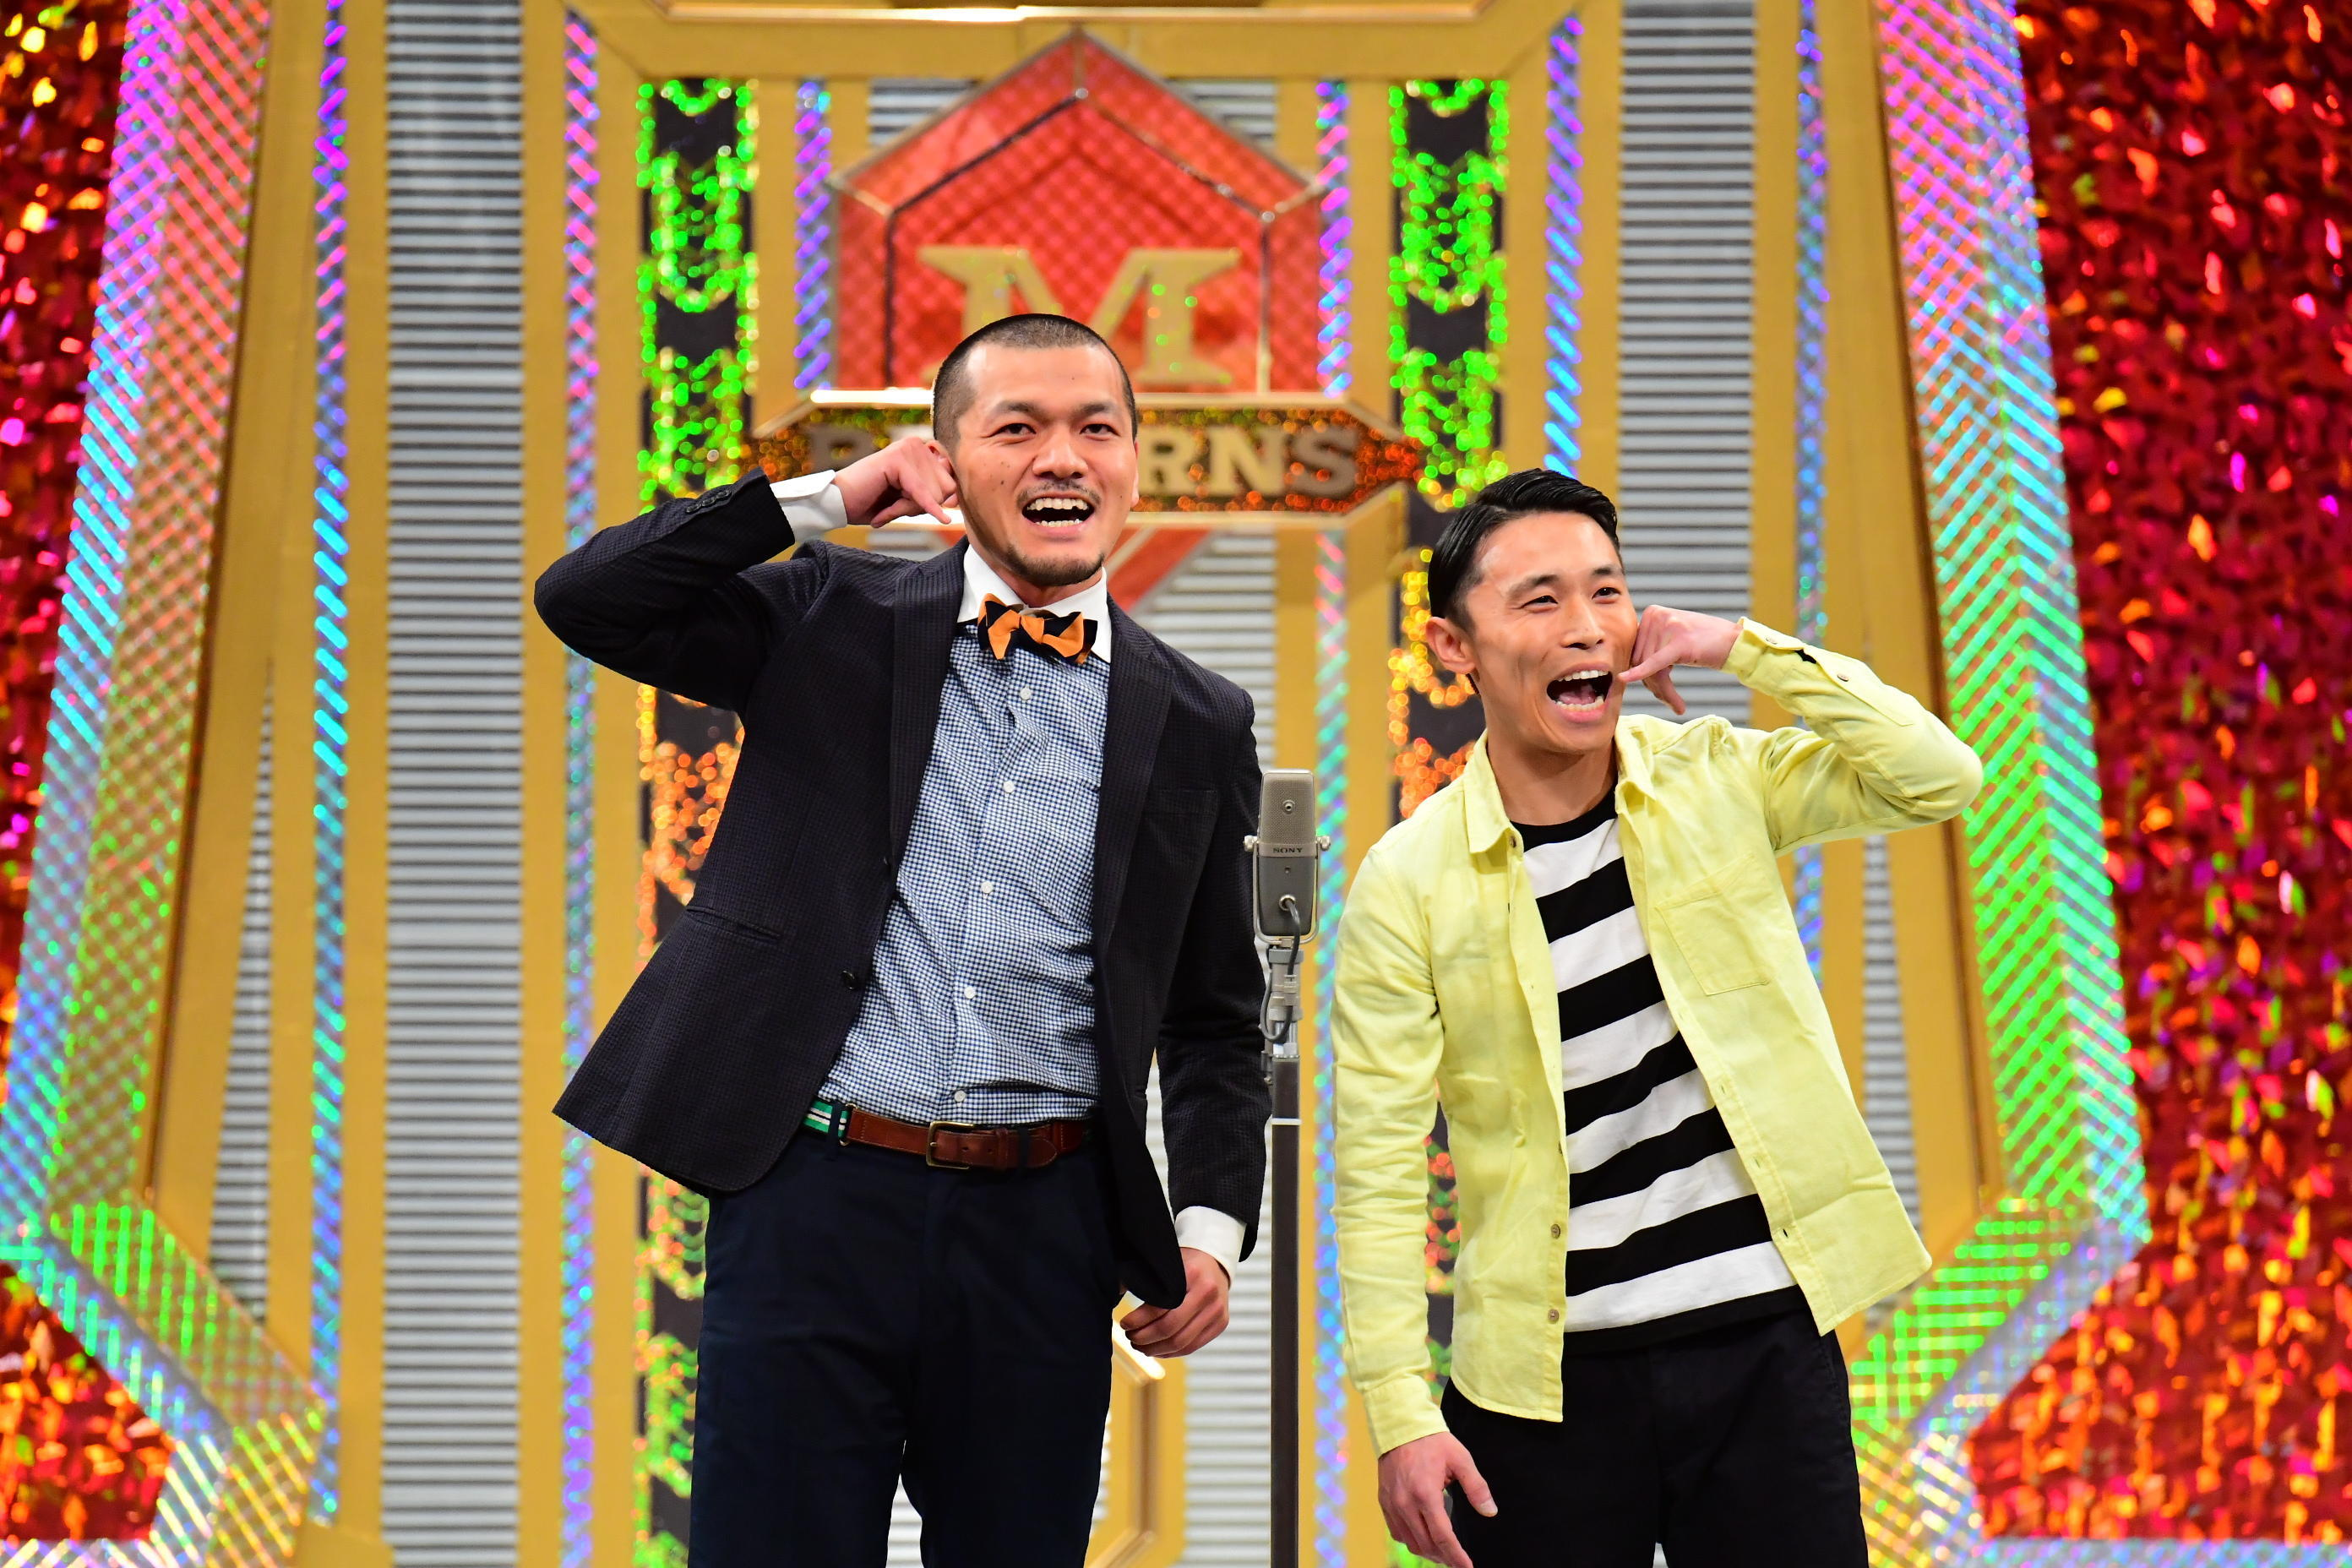 http://news.yoshimoto.co.jp/20170228154955-f71d635252b80064487483de7816370f8f53d40e.jpg